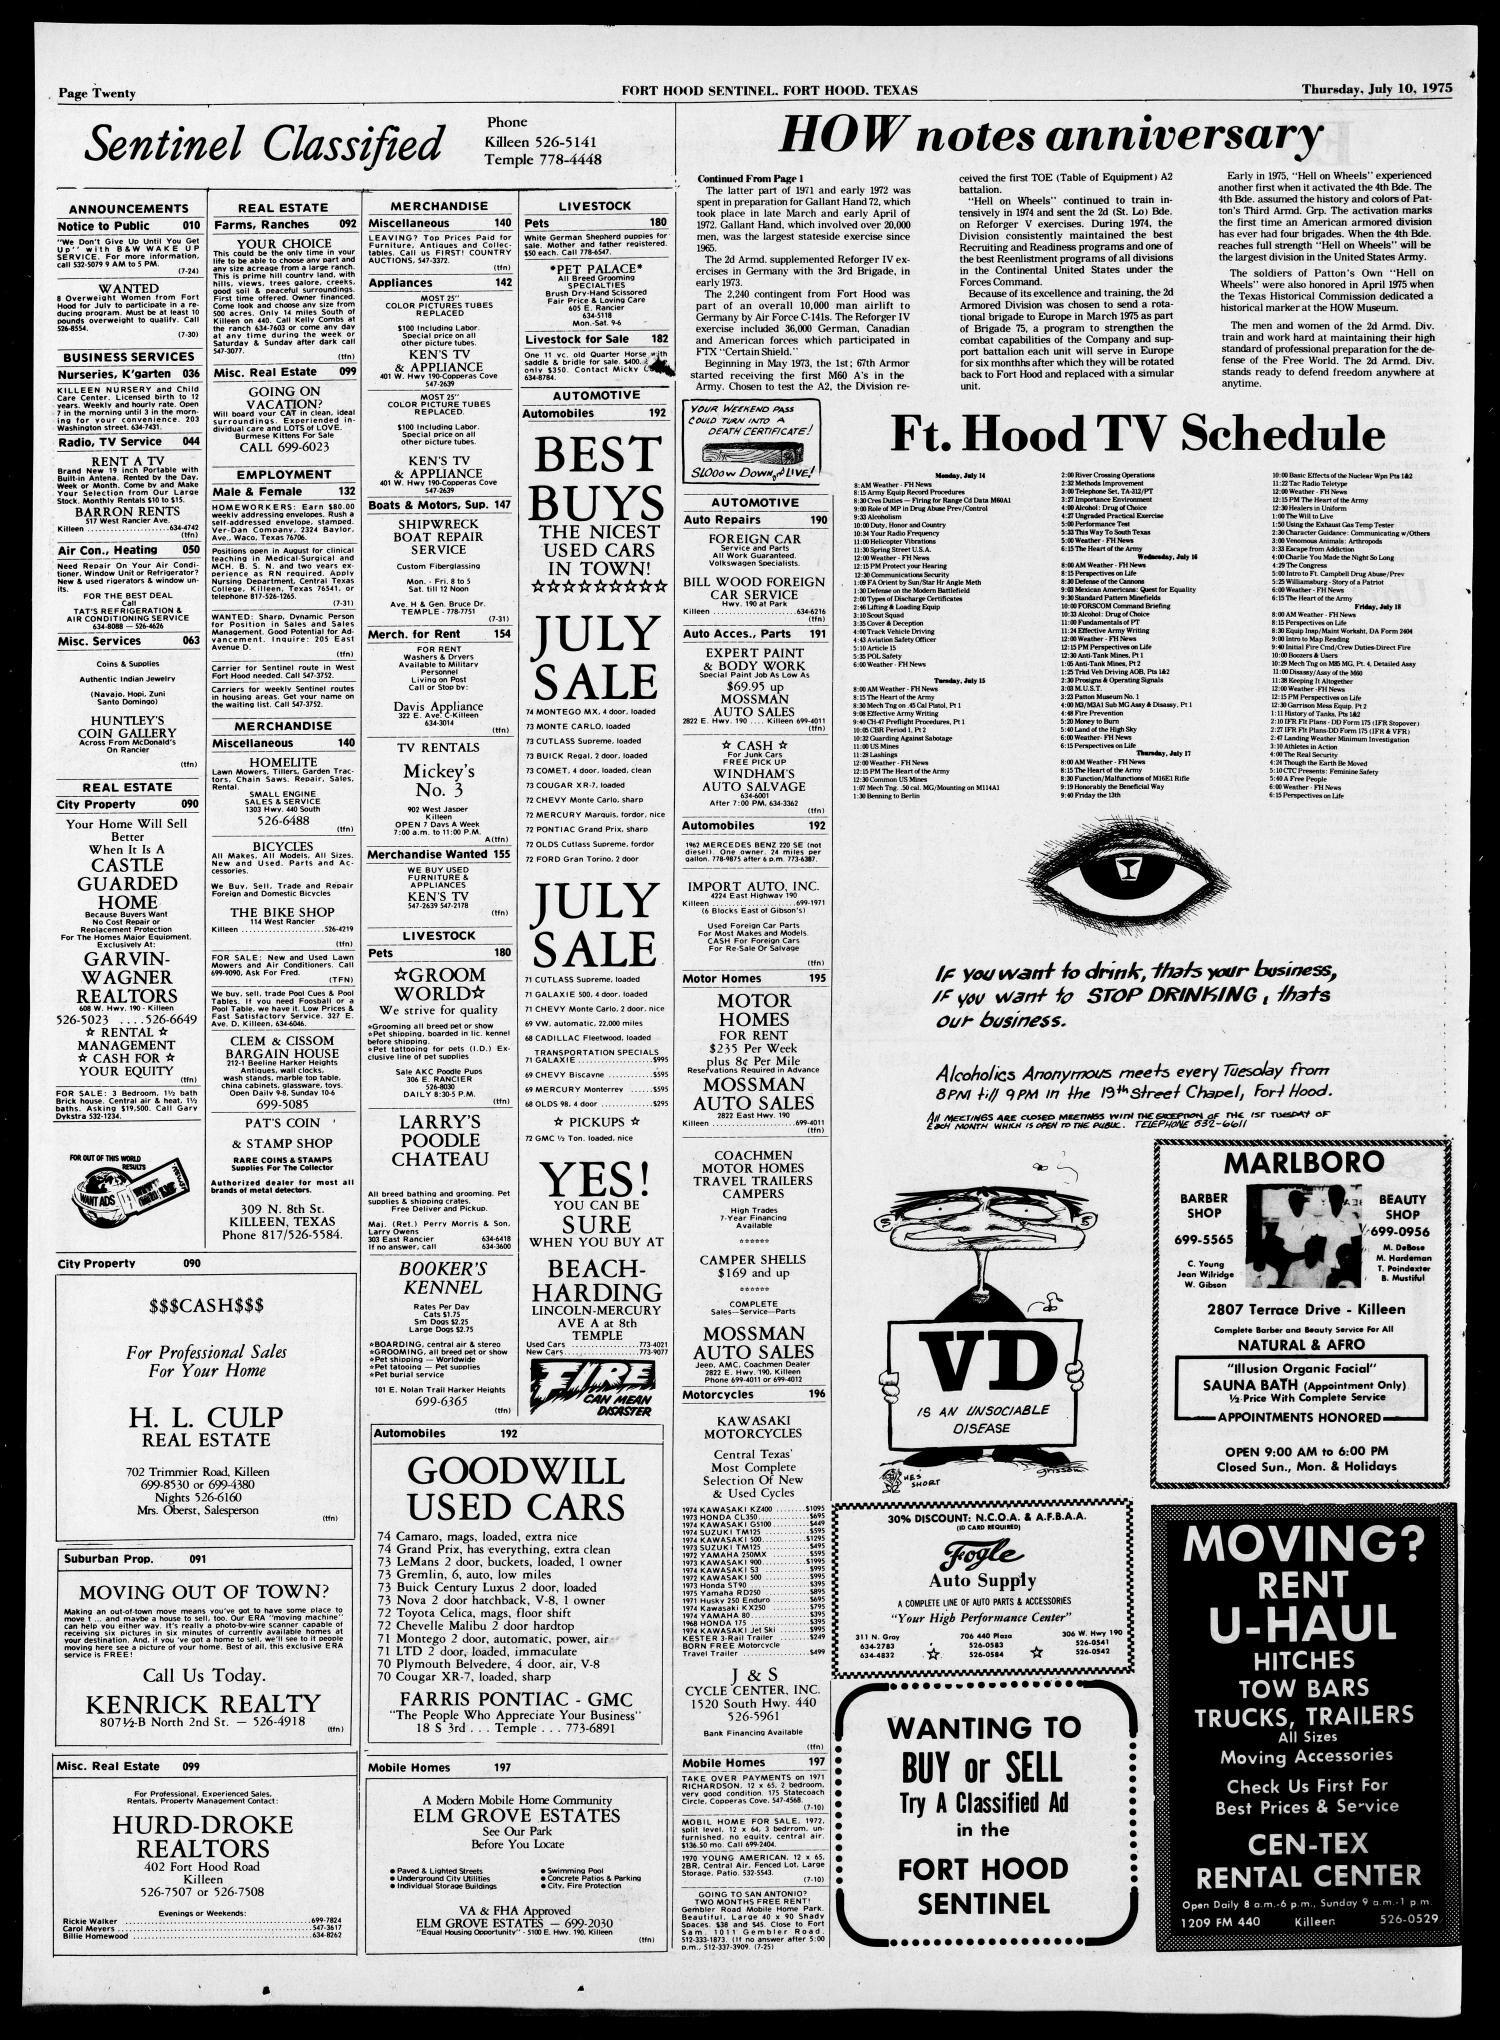 FT. FOOD SENTINEL_10 JUL 1975_PG 20.jpg